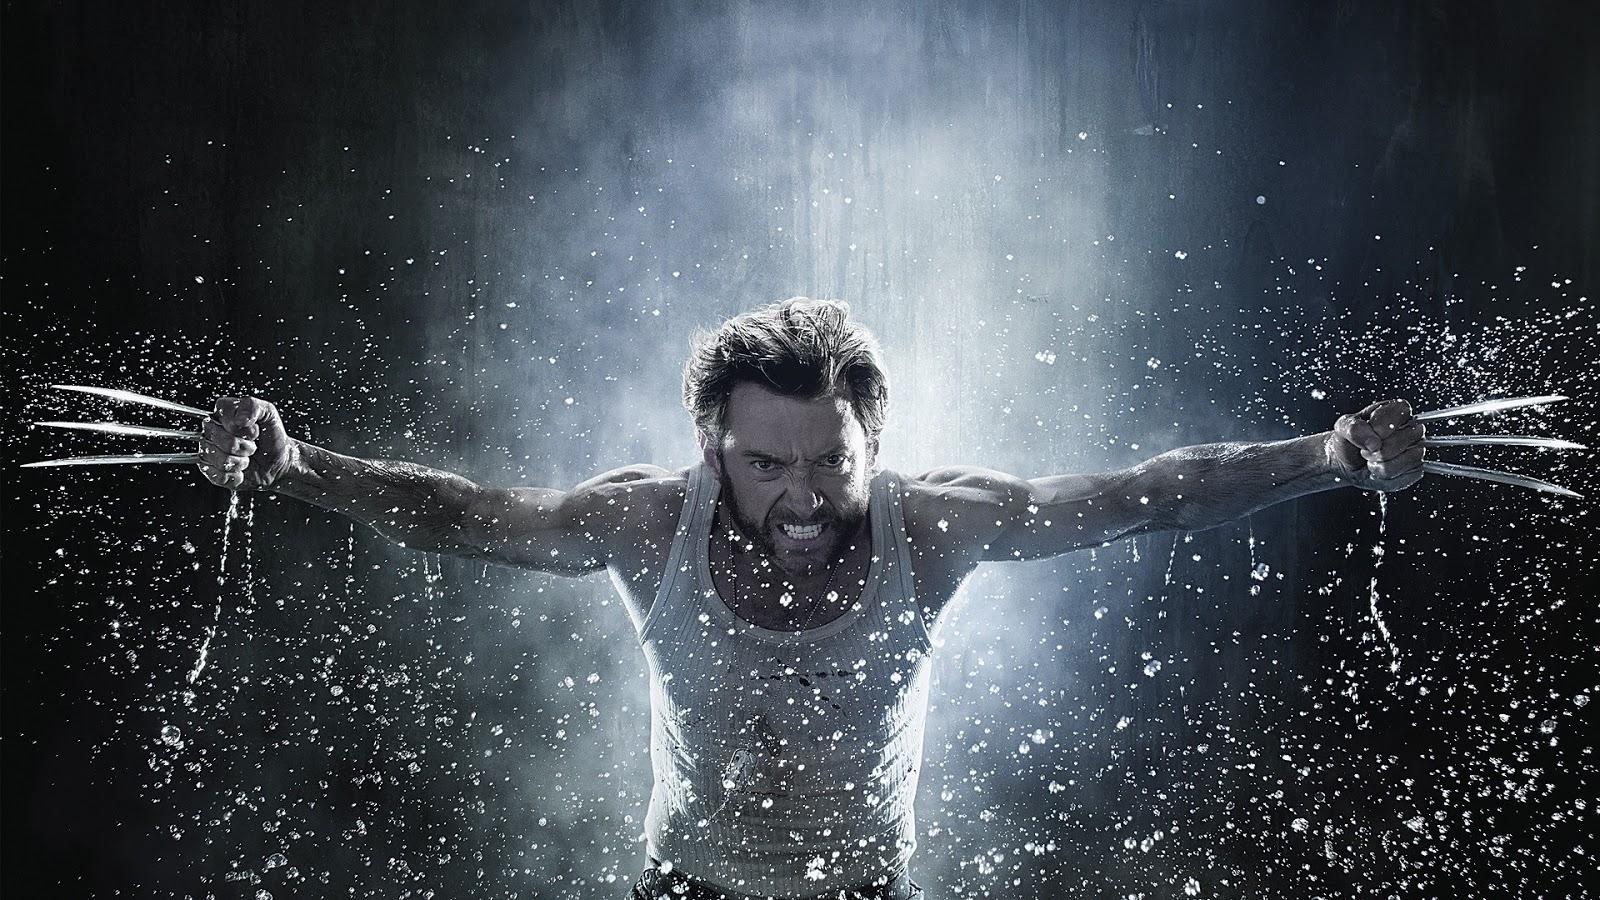 43+] X Men Wolverine HD Wallpaper on WallpaperSafari